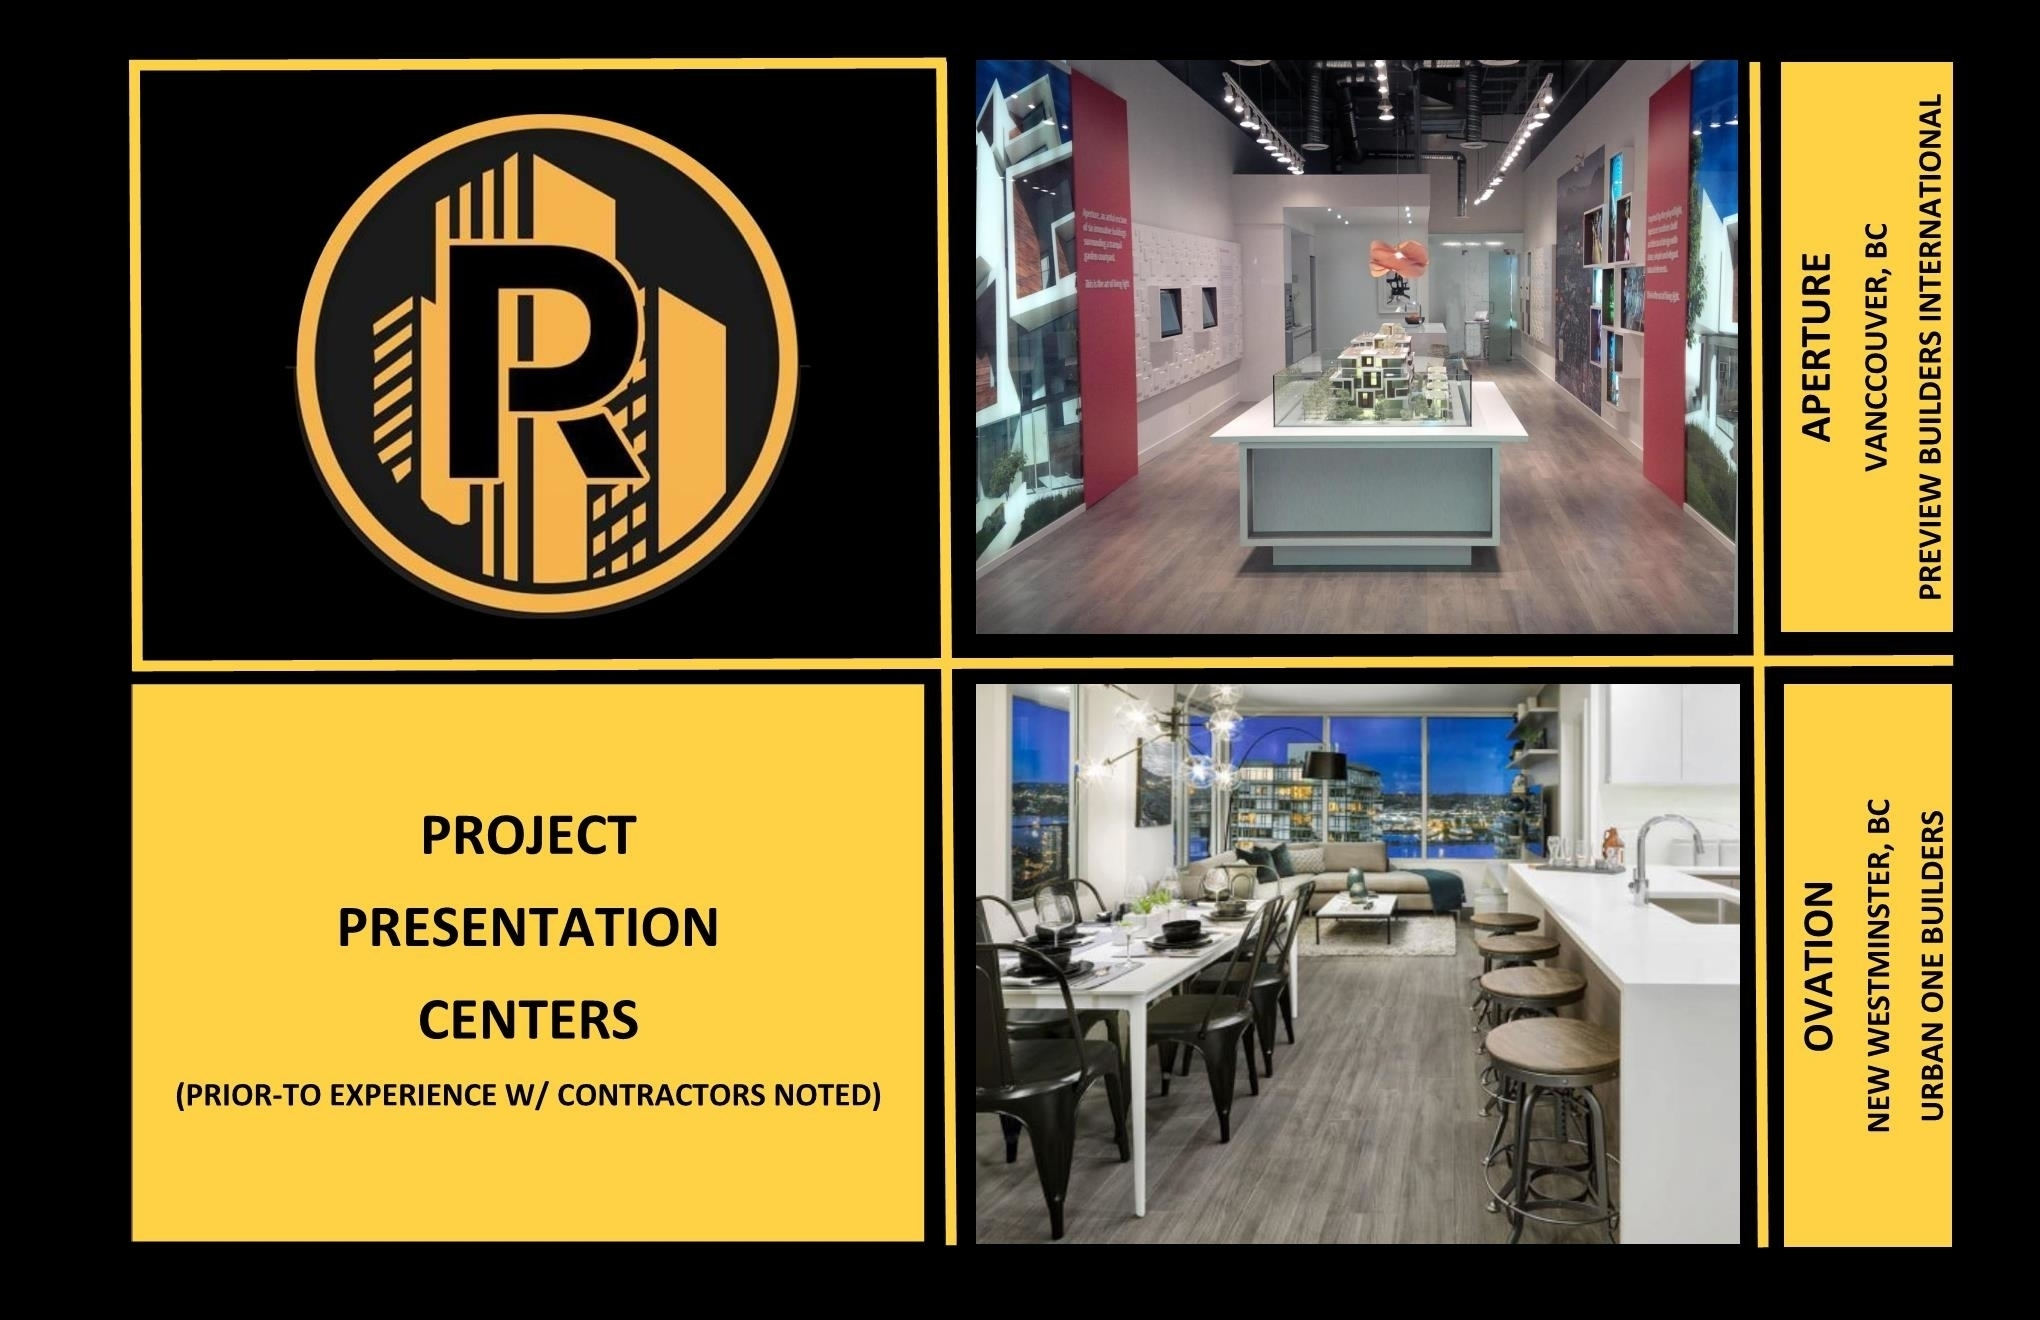 Raudales Enterprise LTD in Vancouver: Real Estate Development Presentation Centers Display Centers Pre-construction Services Design Interiors Project Management